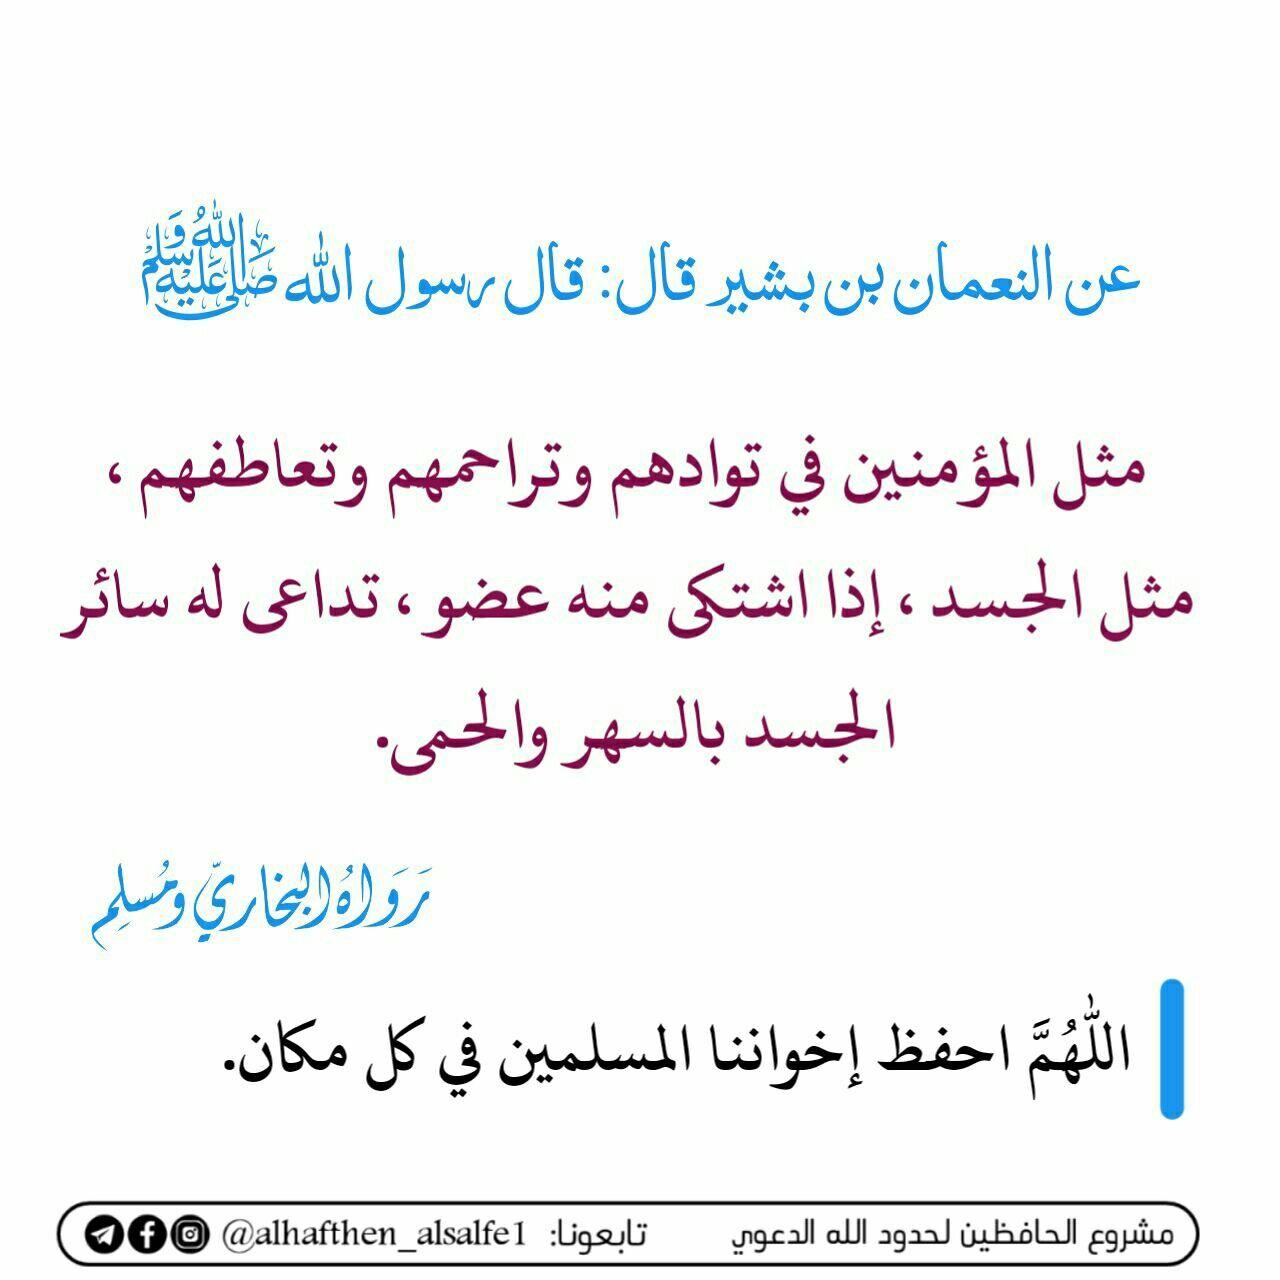 Pin By رغداء ارمنازي On الأحاديث النبوية Math Arabic Calligraphy Calligraphy